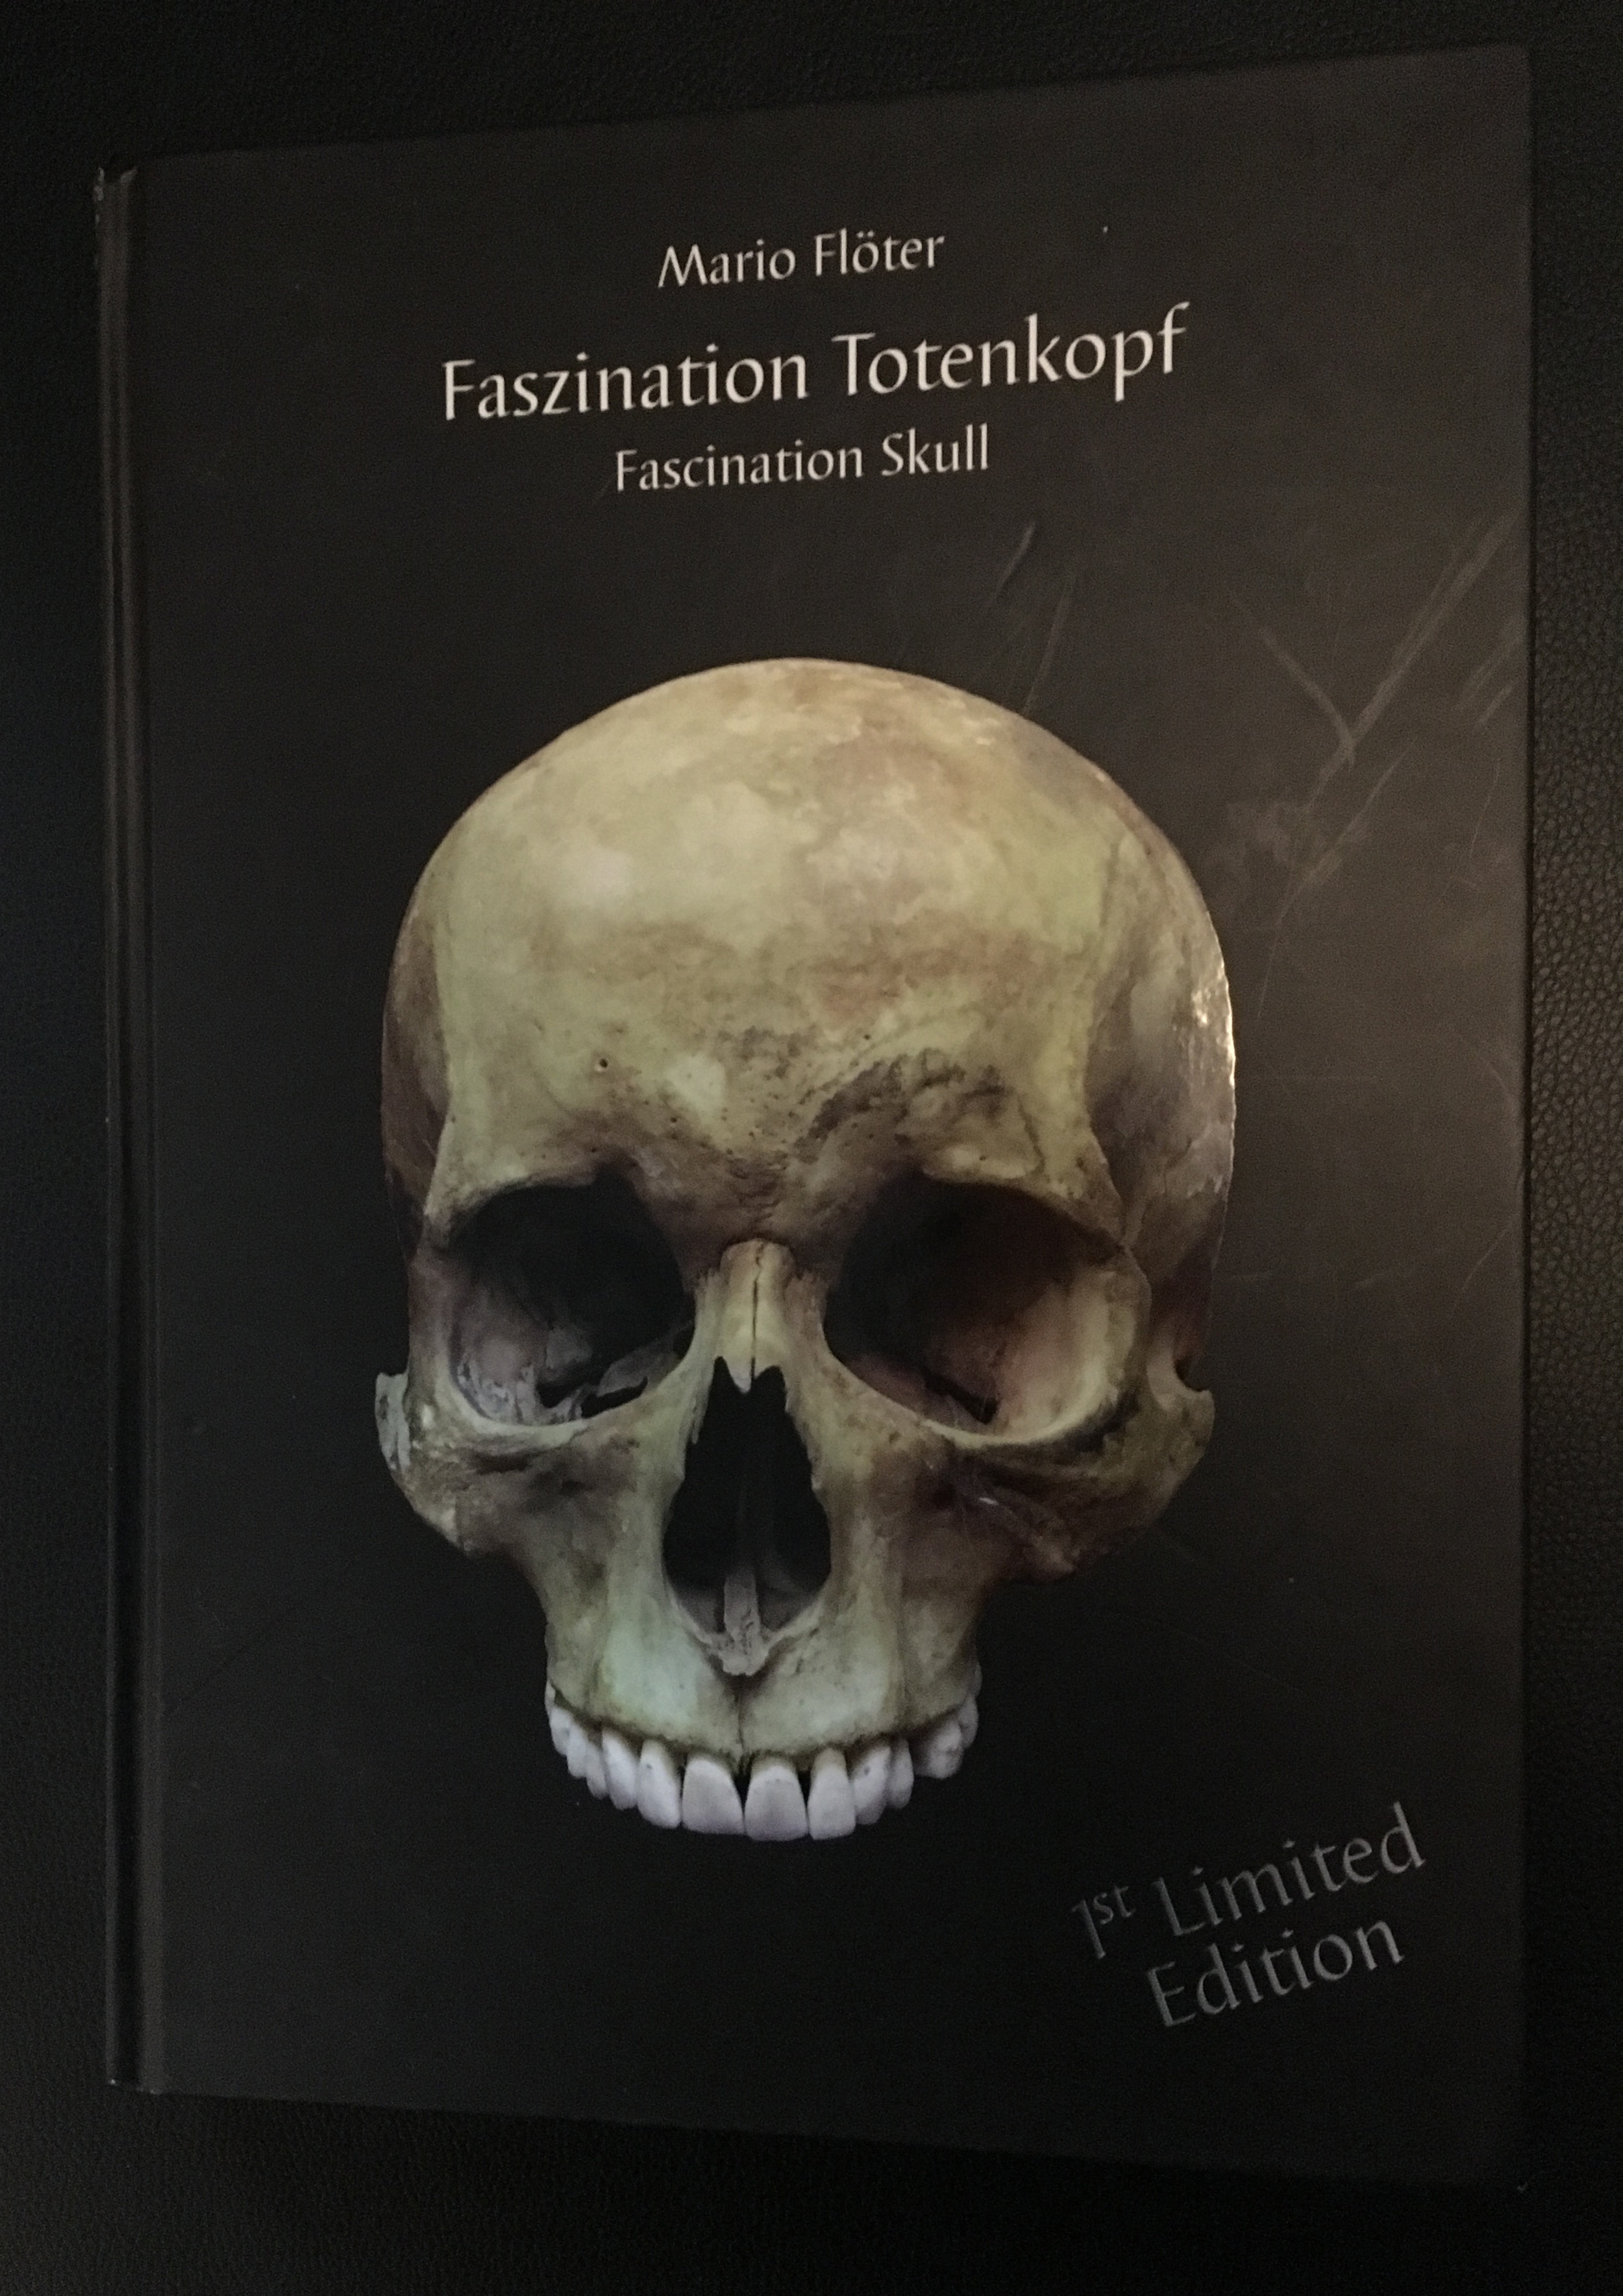 Faszination Totenkopf, Book